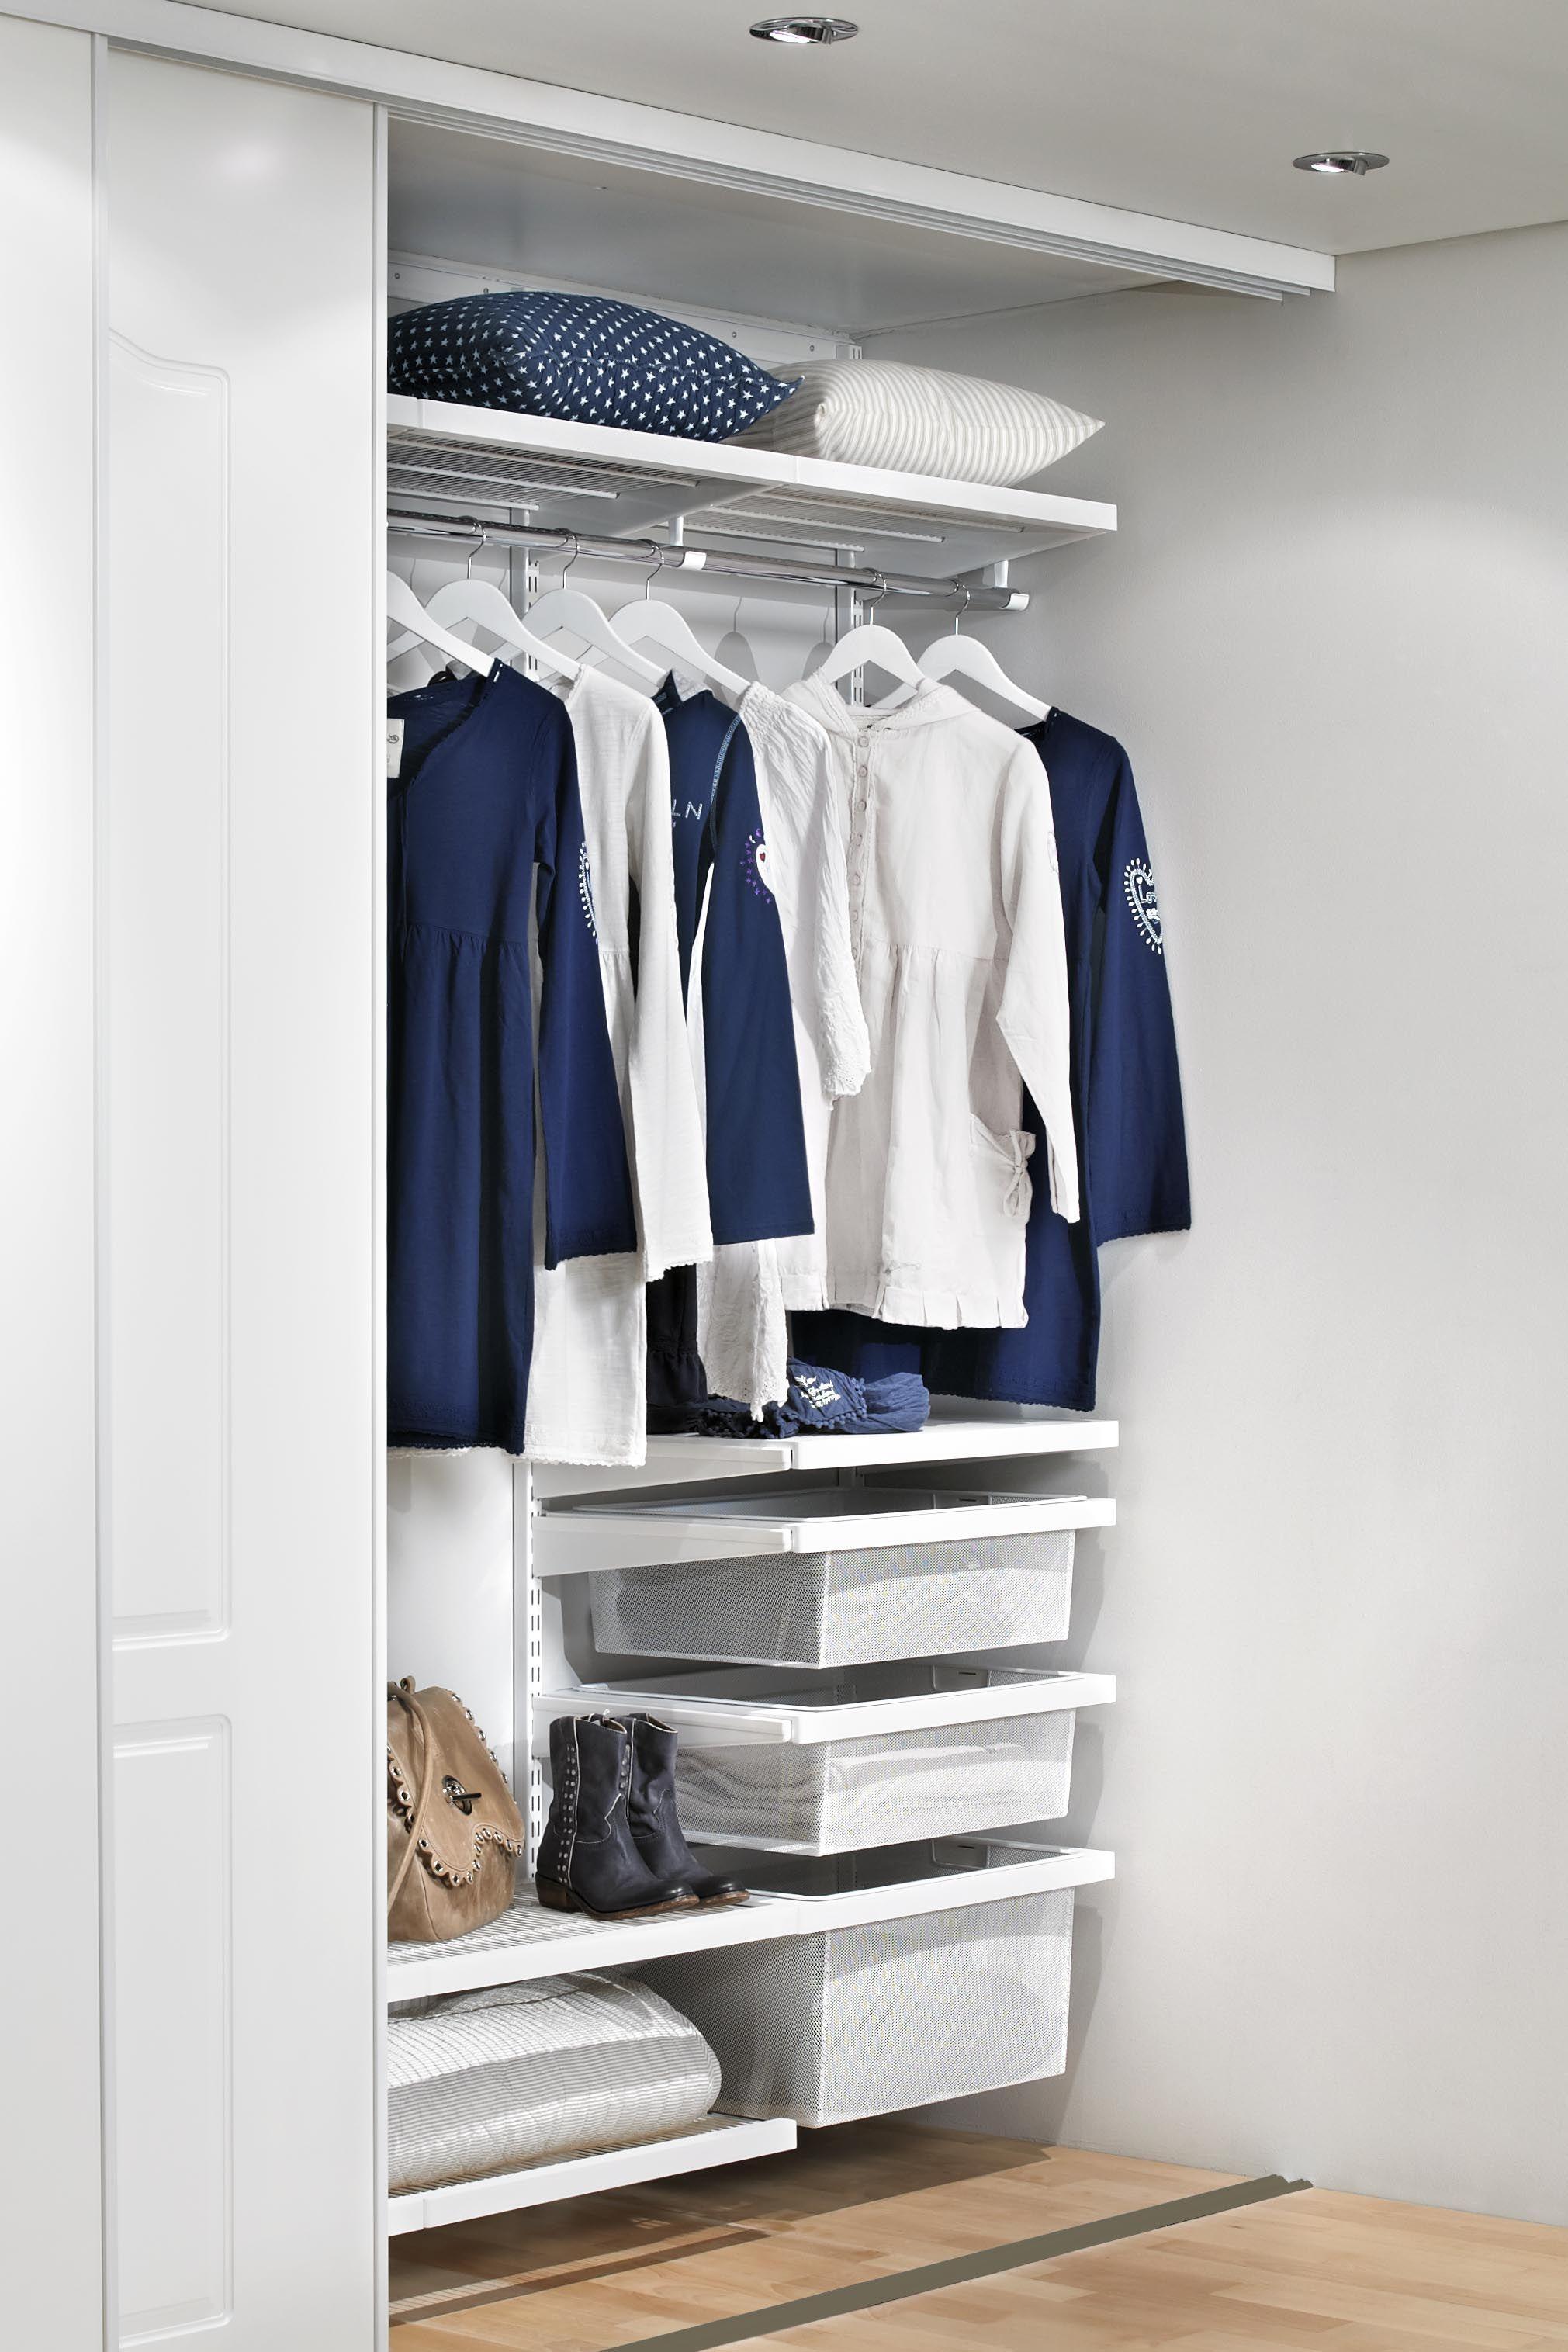 Elfa White Decor Wardobe Wardrobe Organisation White Decor Elfa Closet